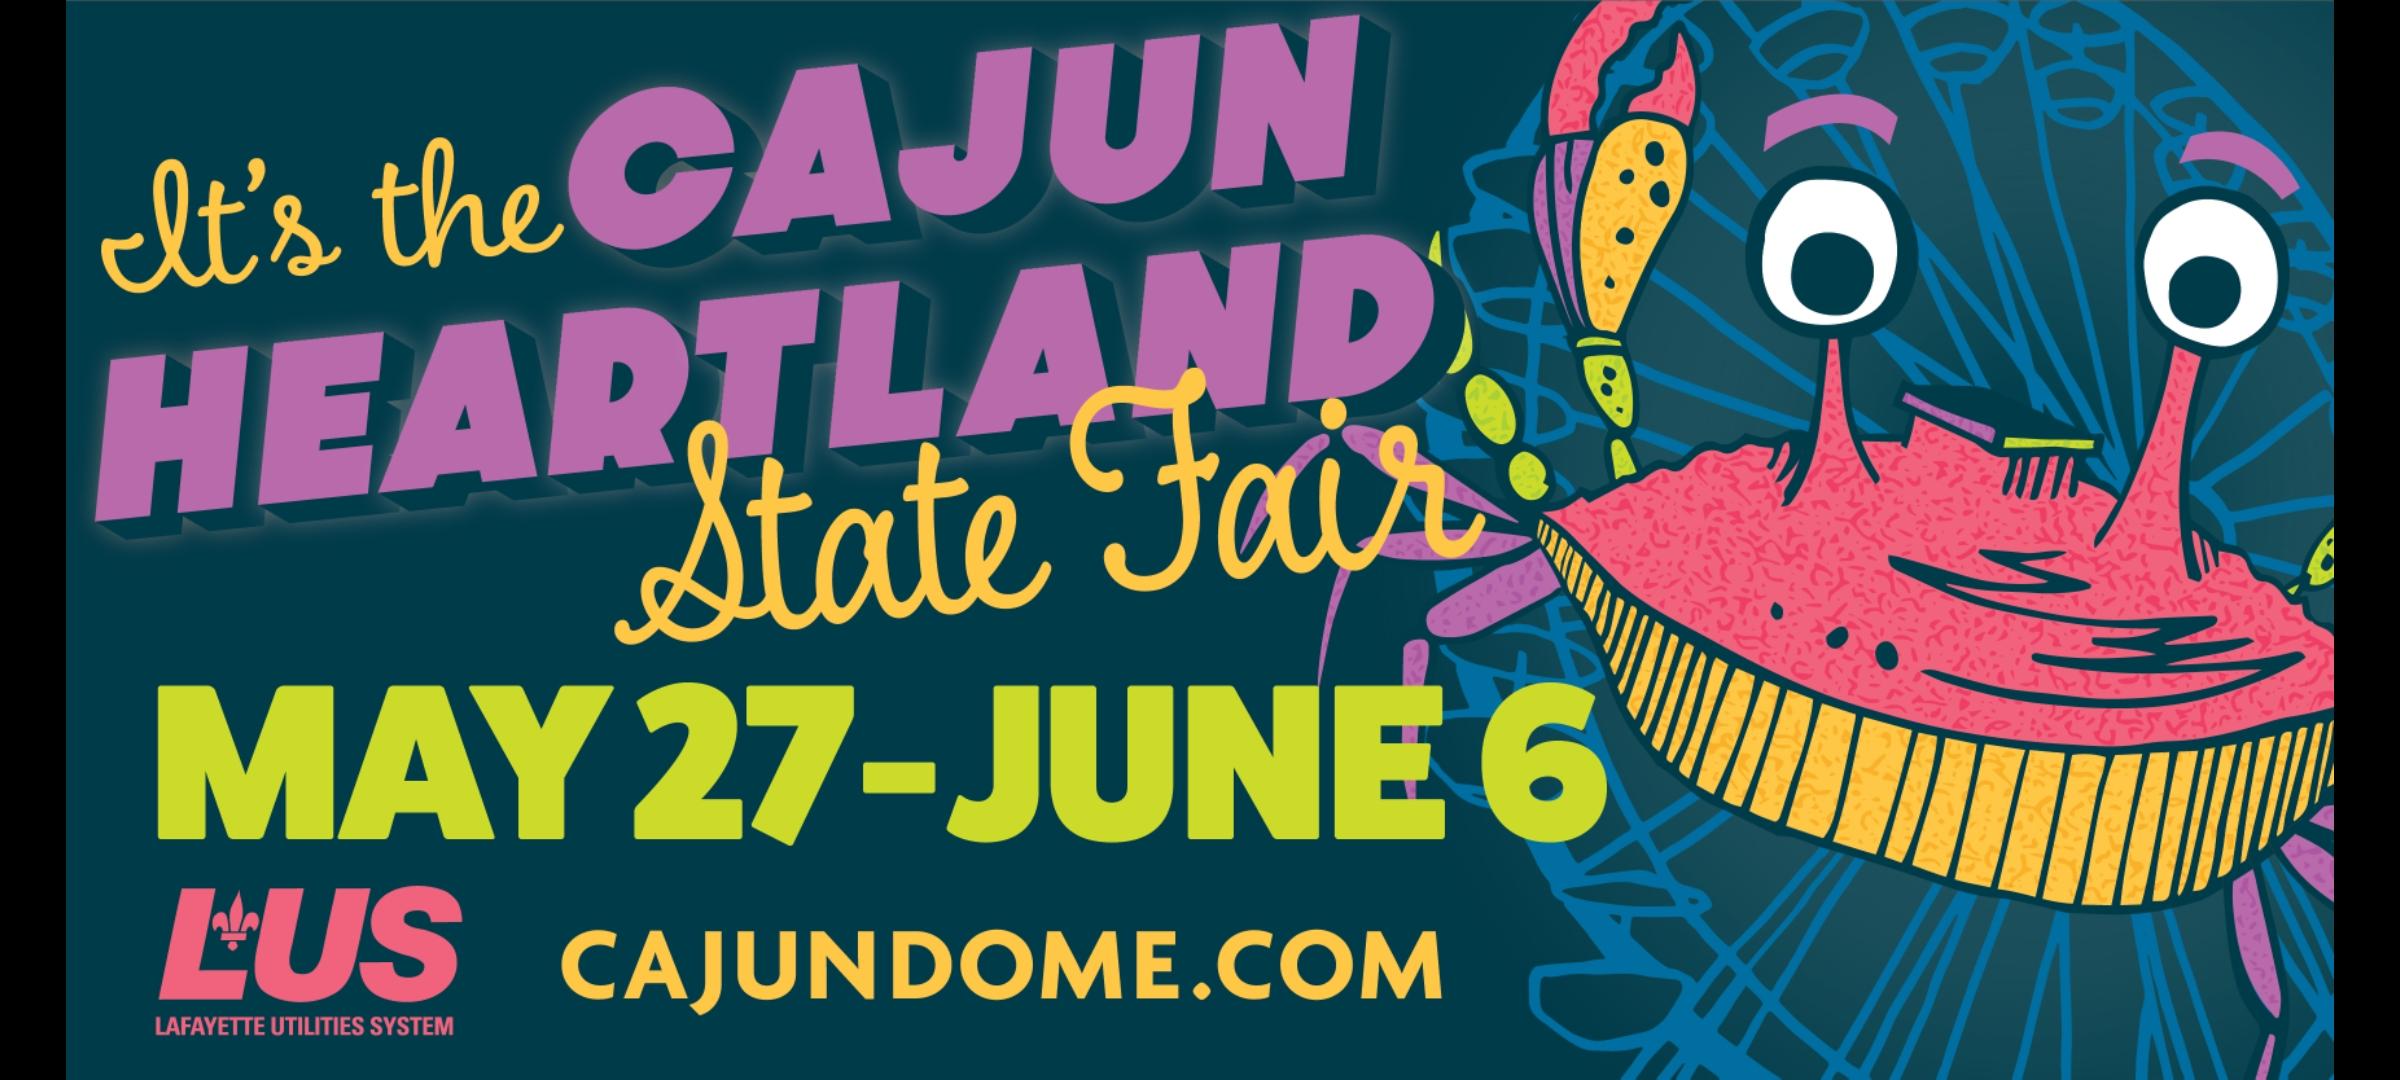 Cajun Heartland State Fair Returns to Cajundome